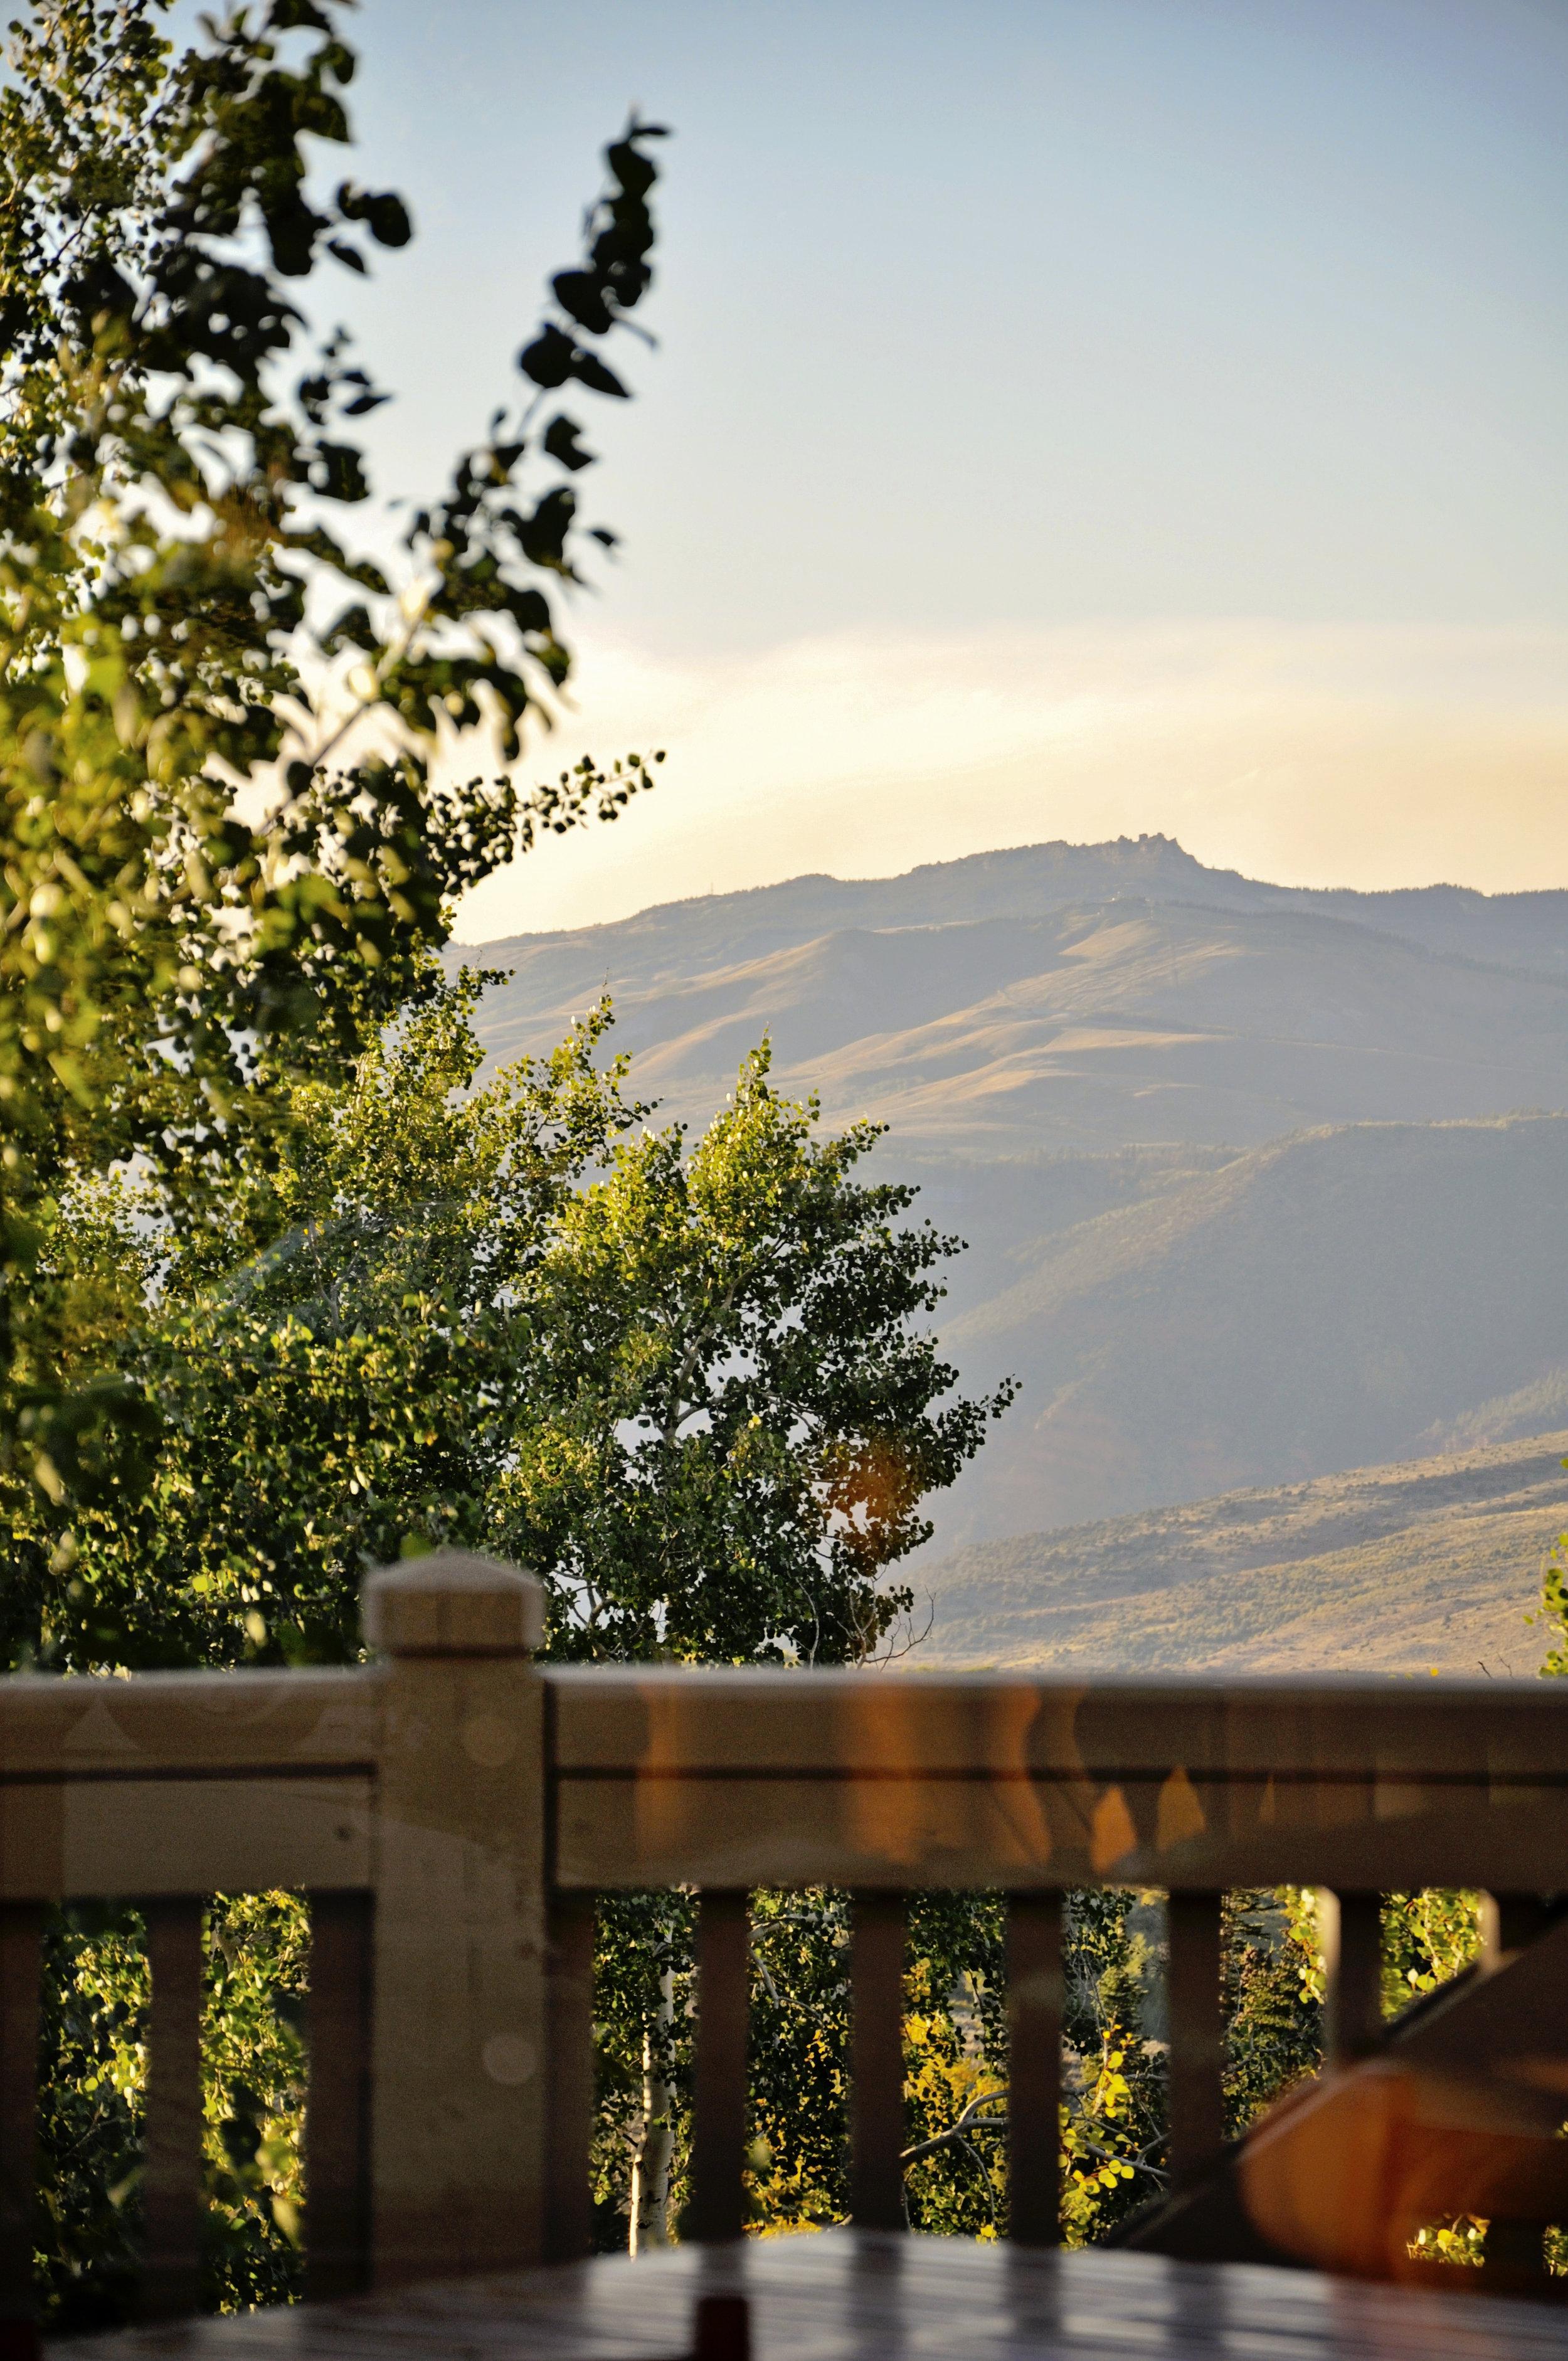 Sunset at the Tips! The Summit Club at Cordillera...9200 feet!